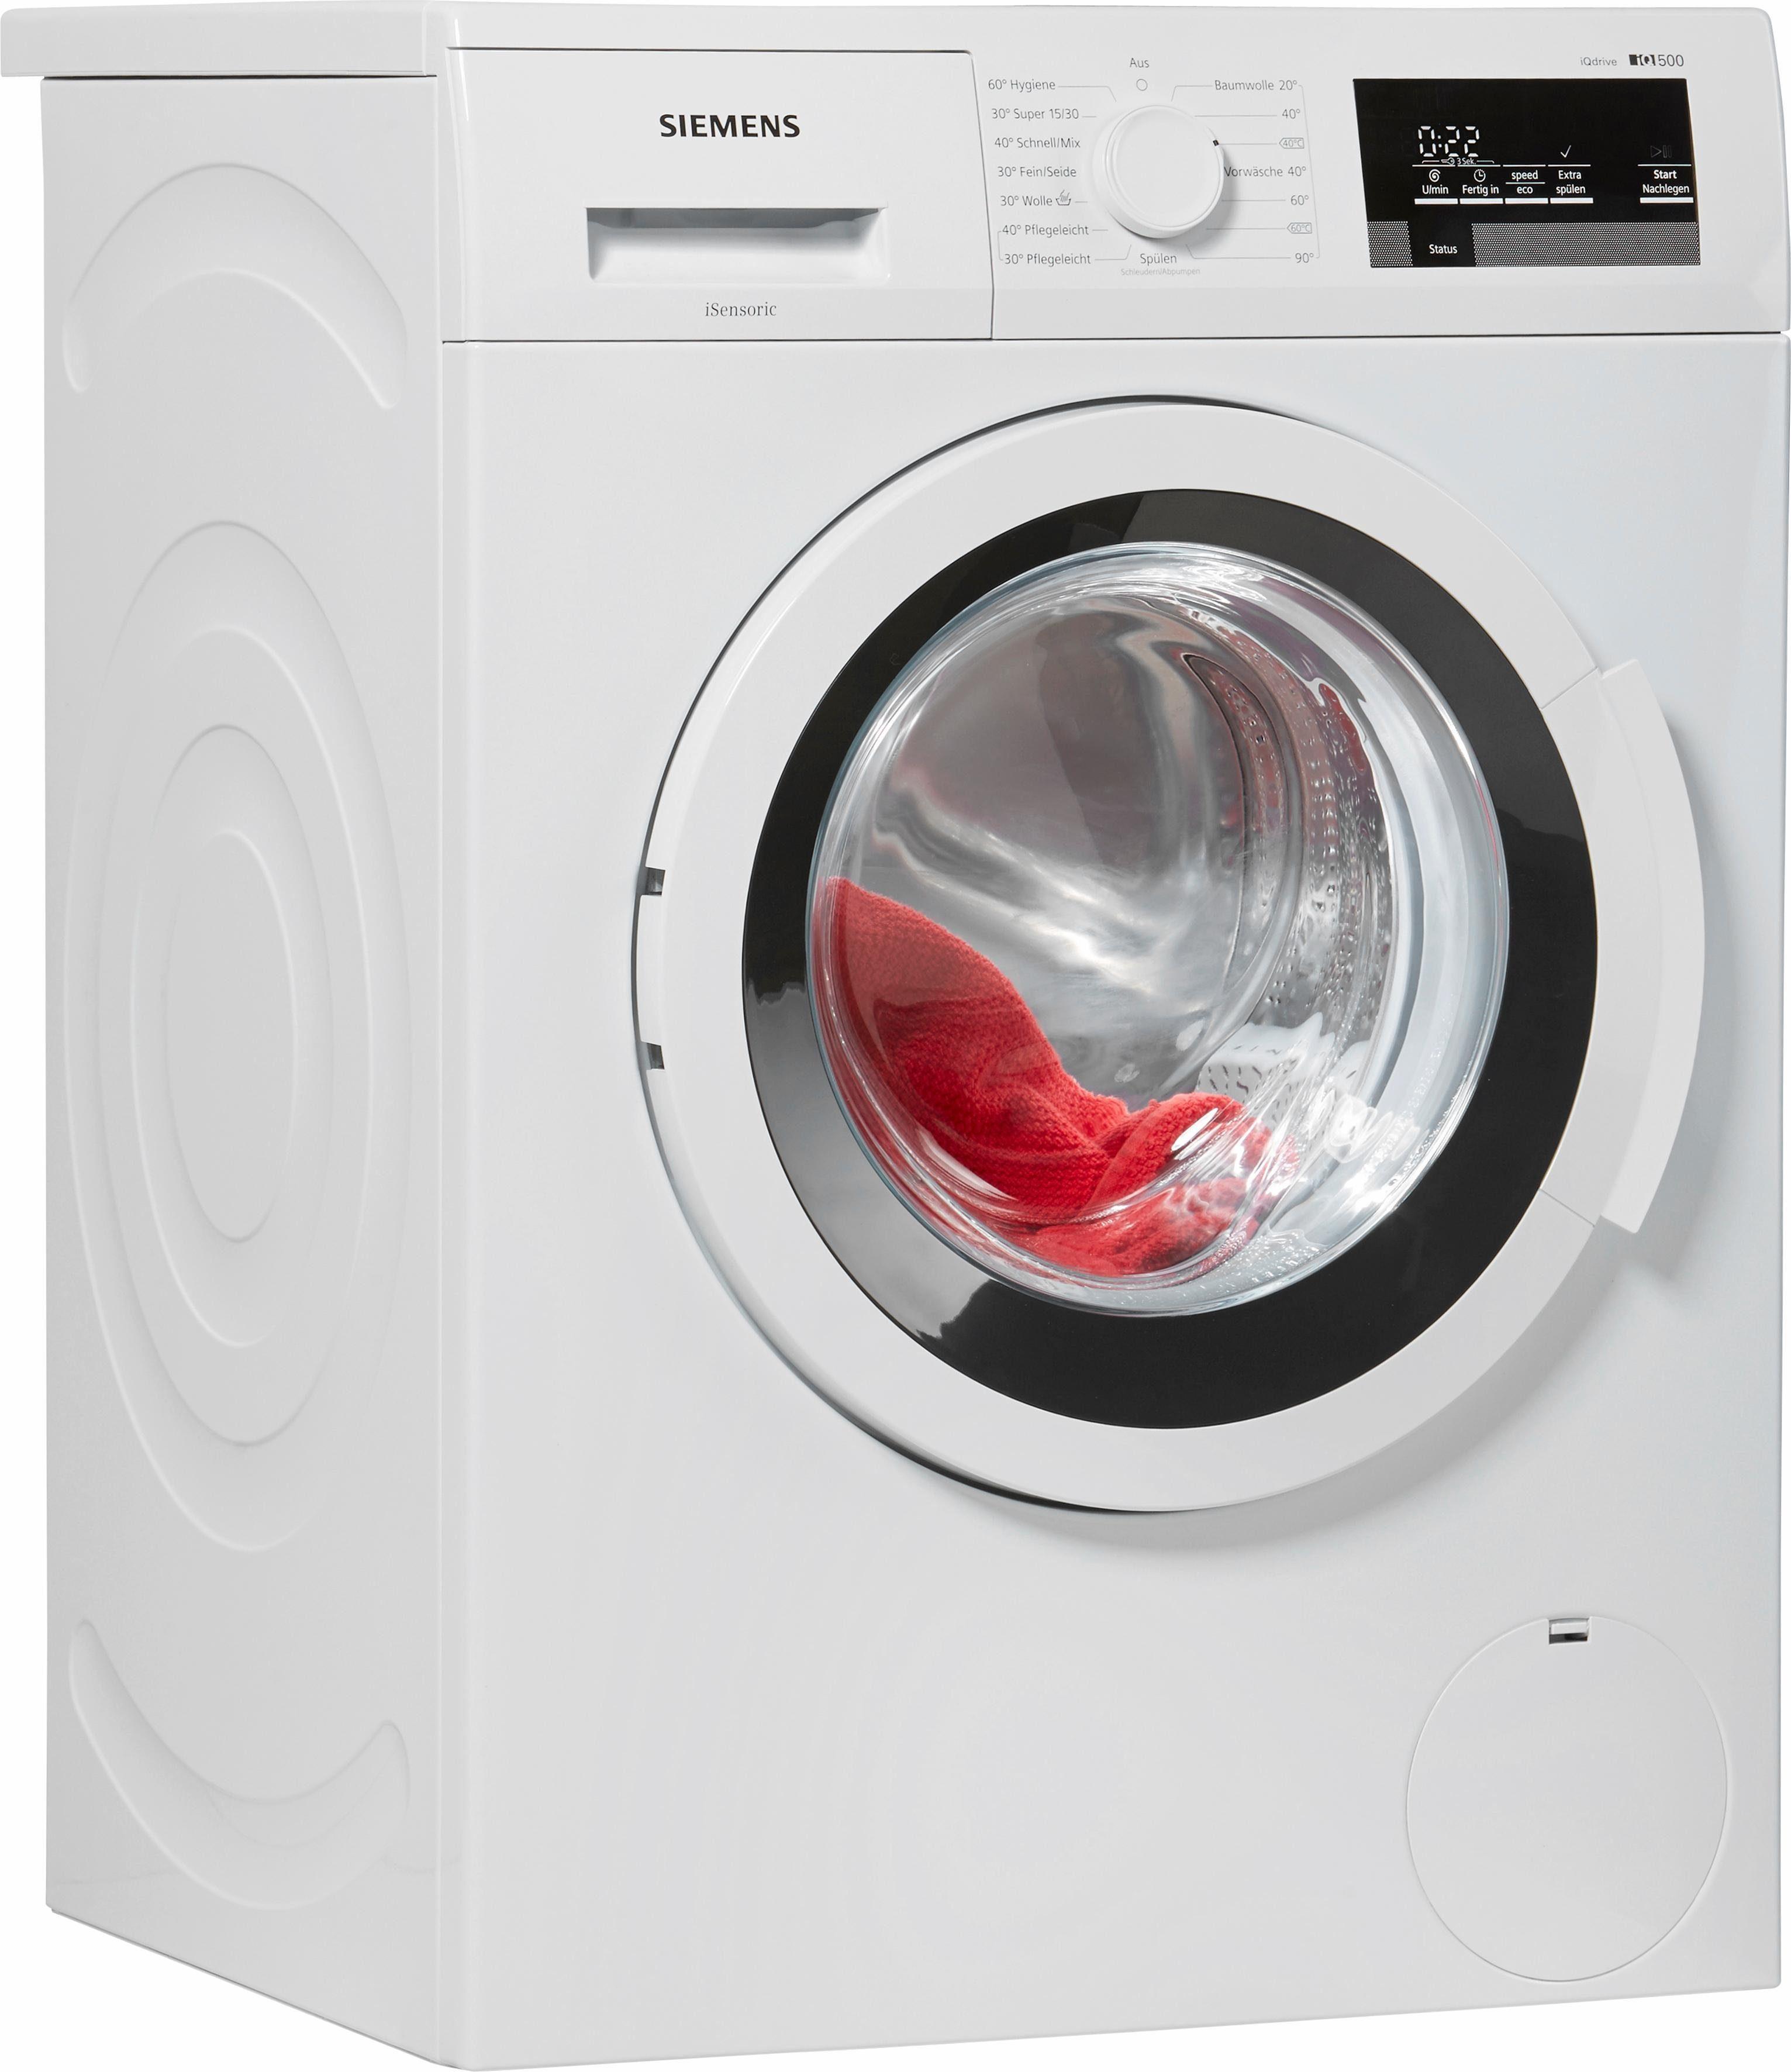 SIEMENS Waschmaschine iQ500 WM14T3V0, A+++, 8 kg, 1400 U/Min